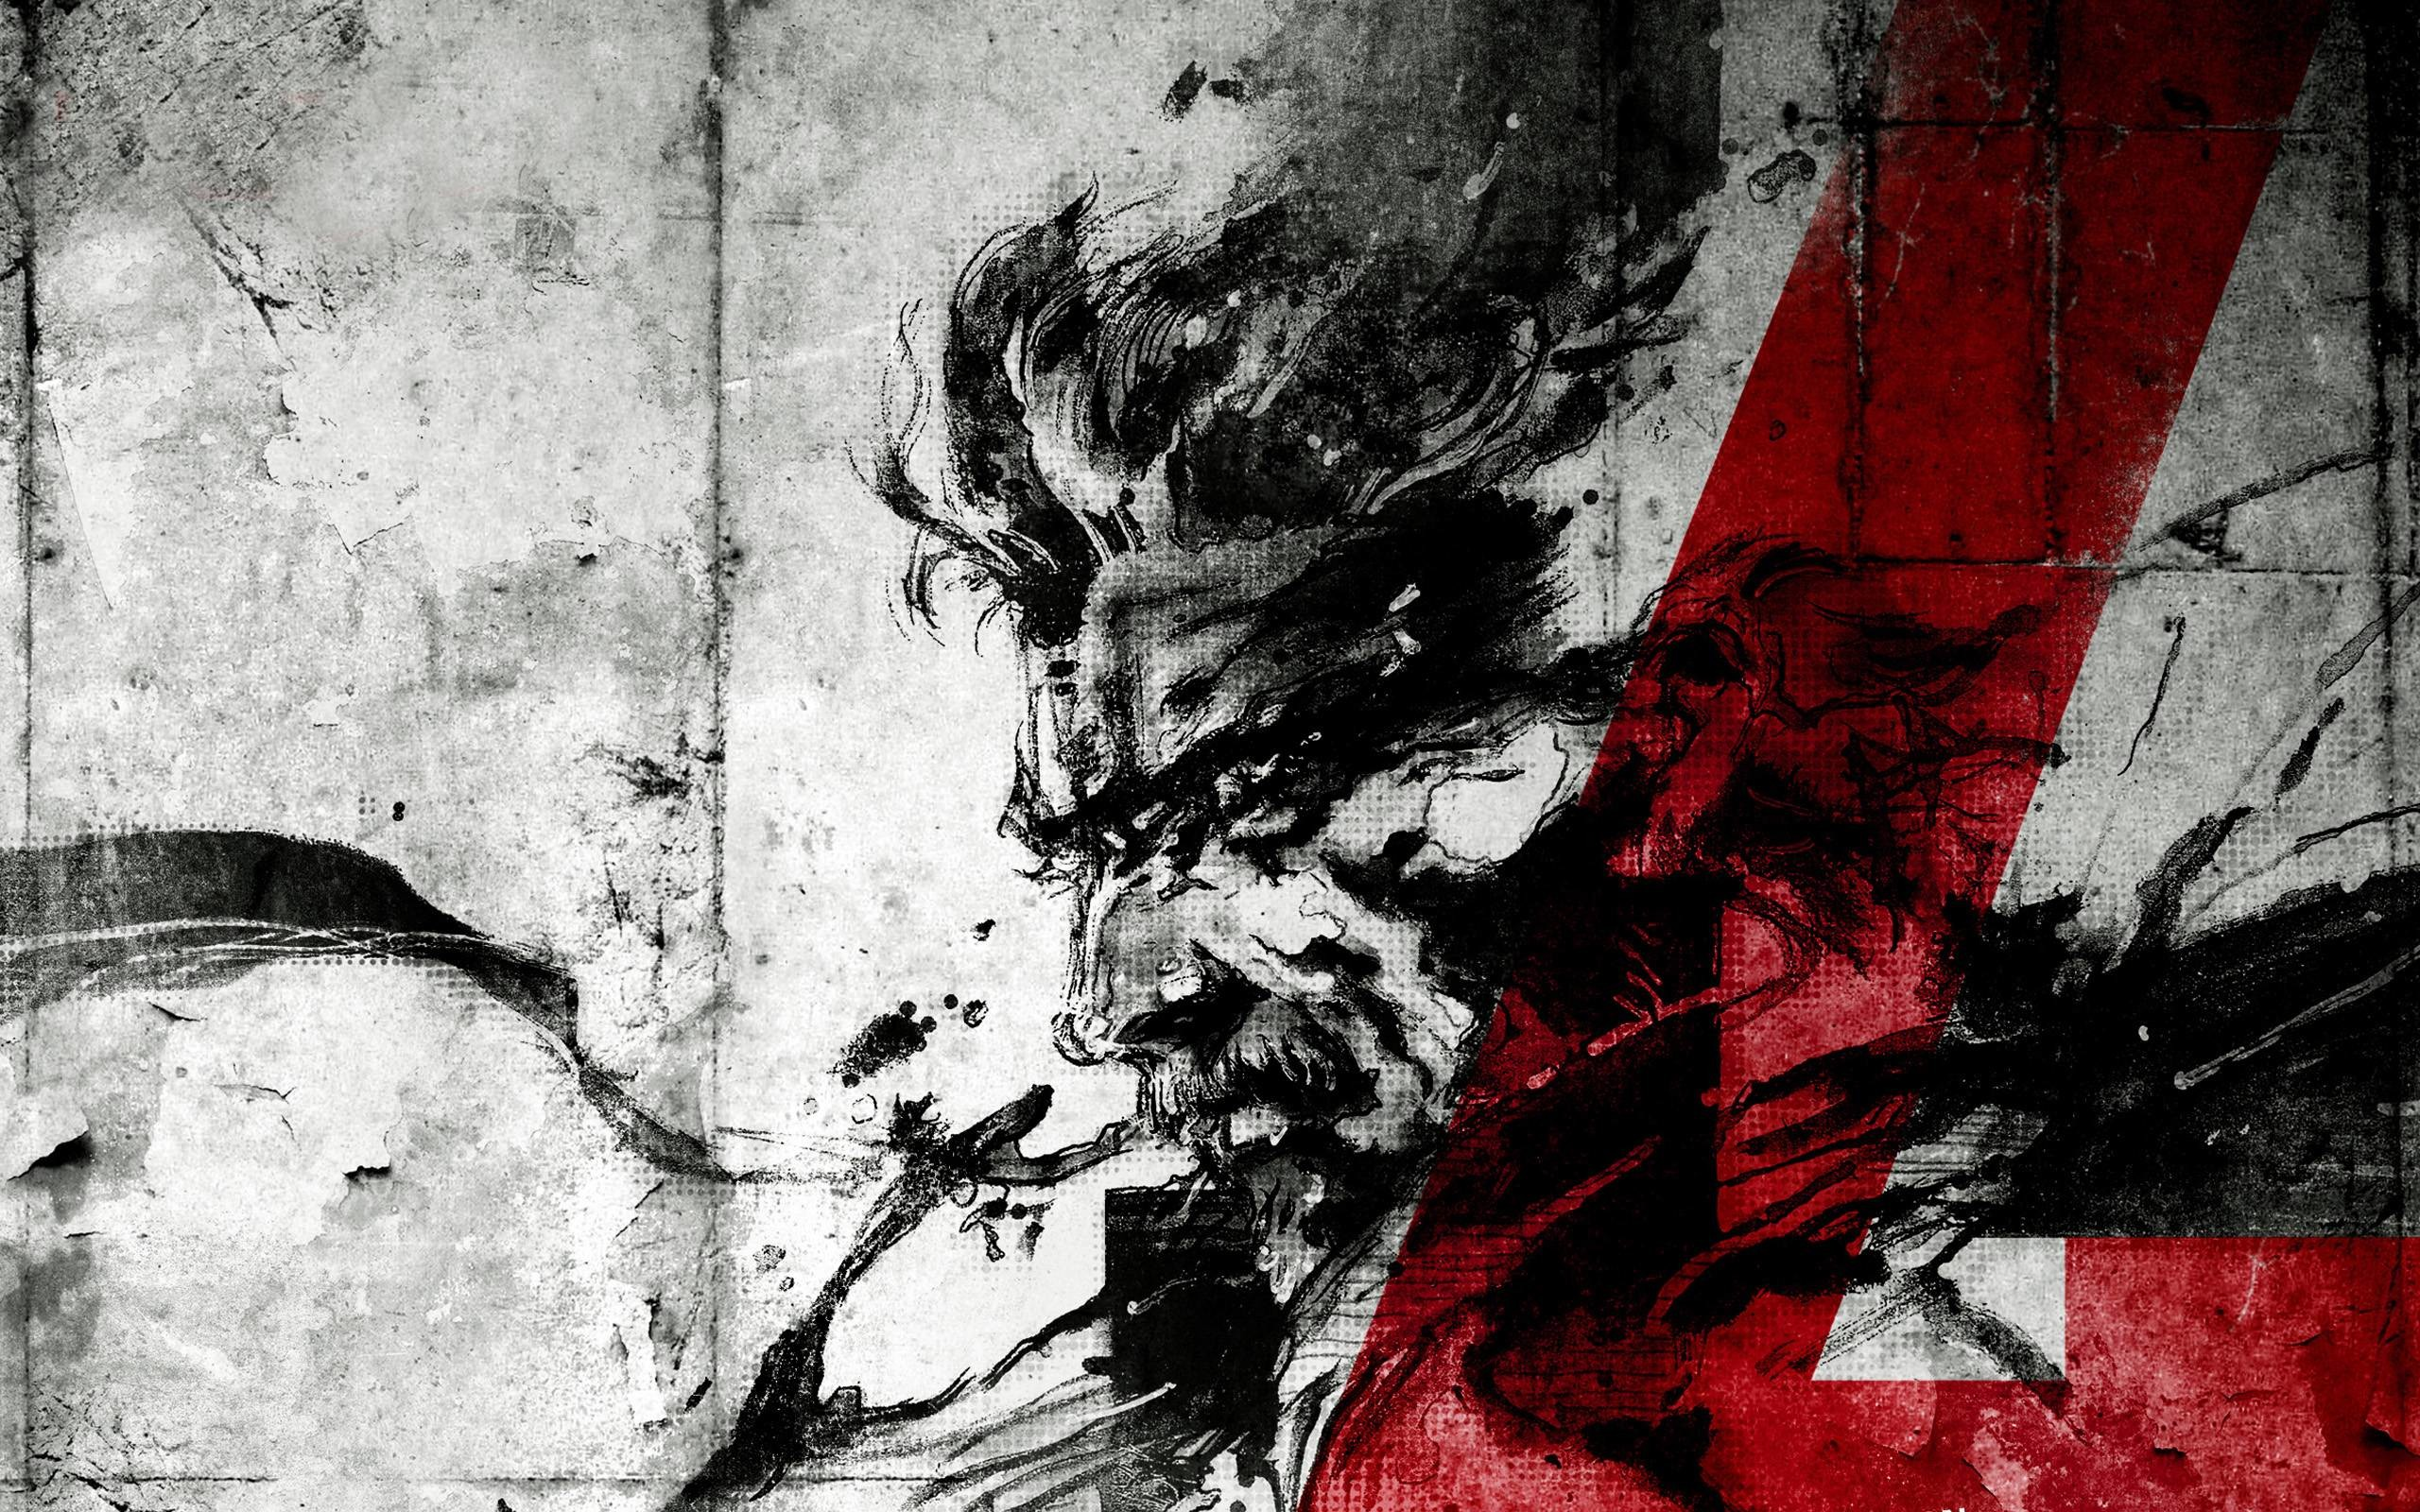 228 Metal Gear Wallpapers | Metal Gear Backgrounds Page 5